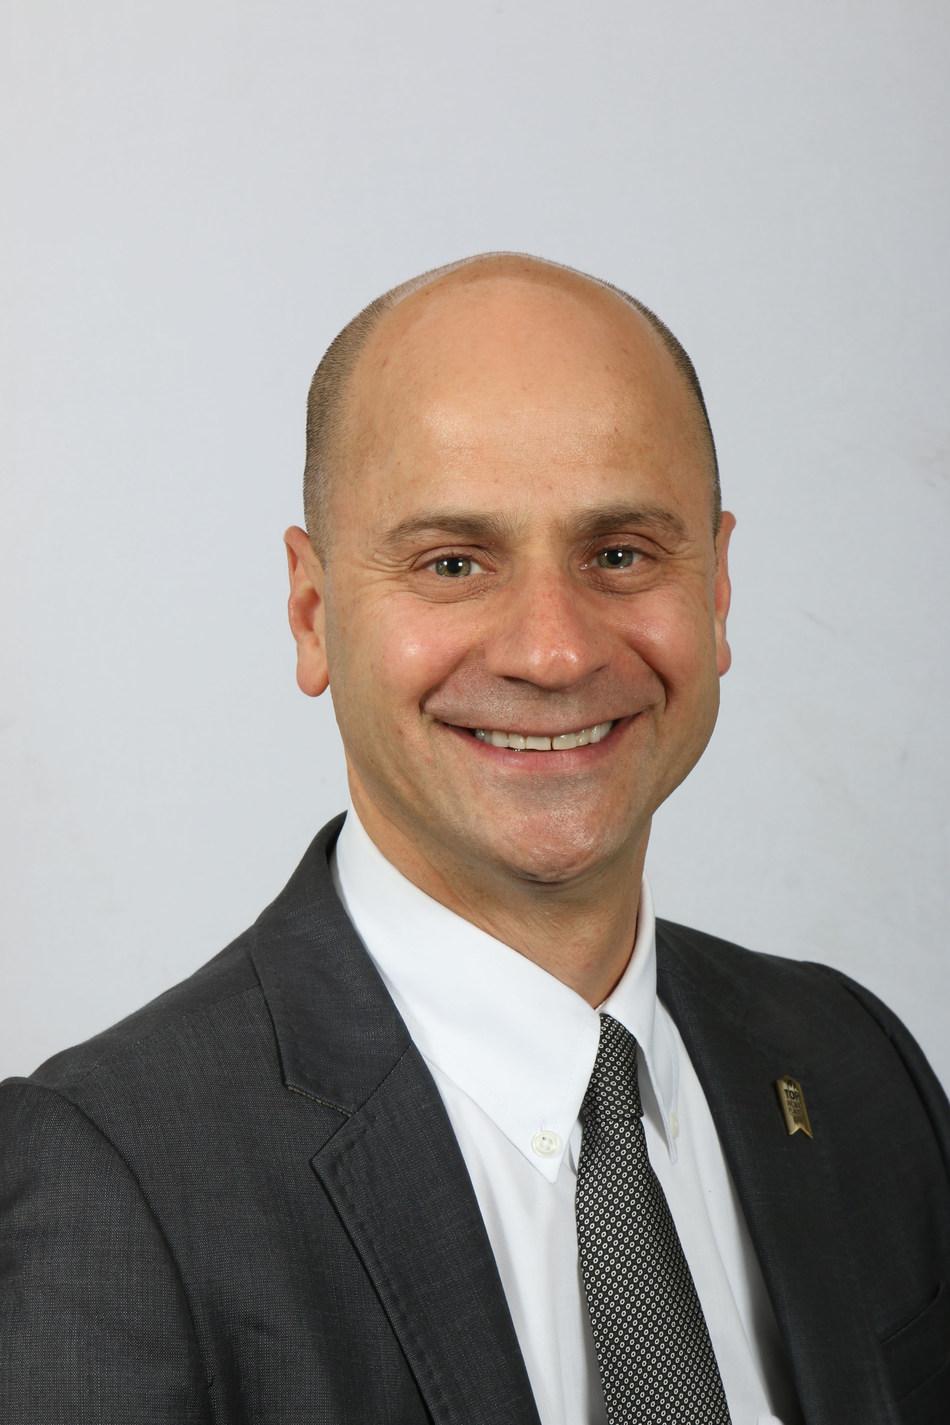 Lou Anatrella, Chief Human Resources Officer, Chesapeake Utilities Corporation.